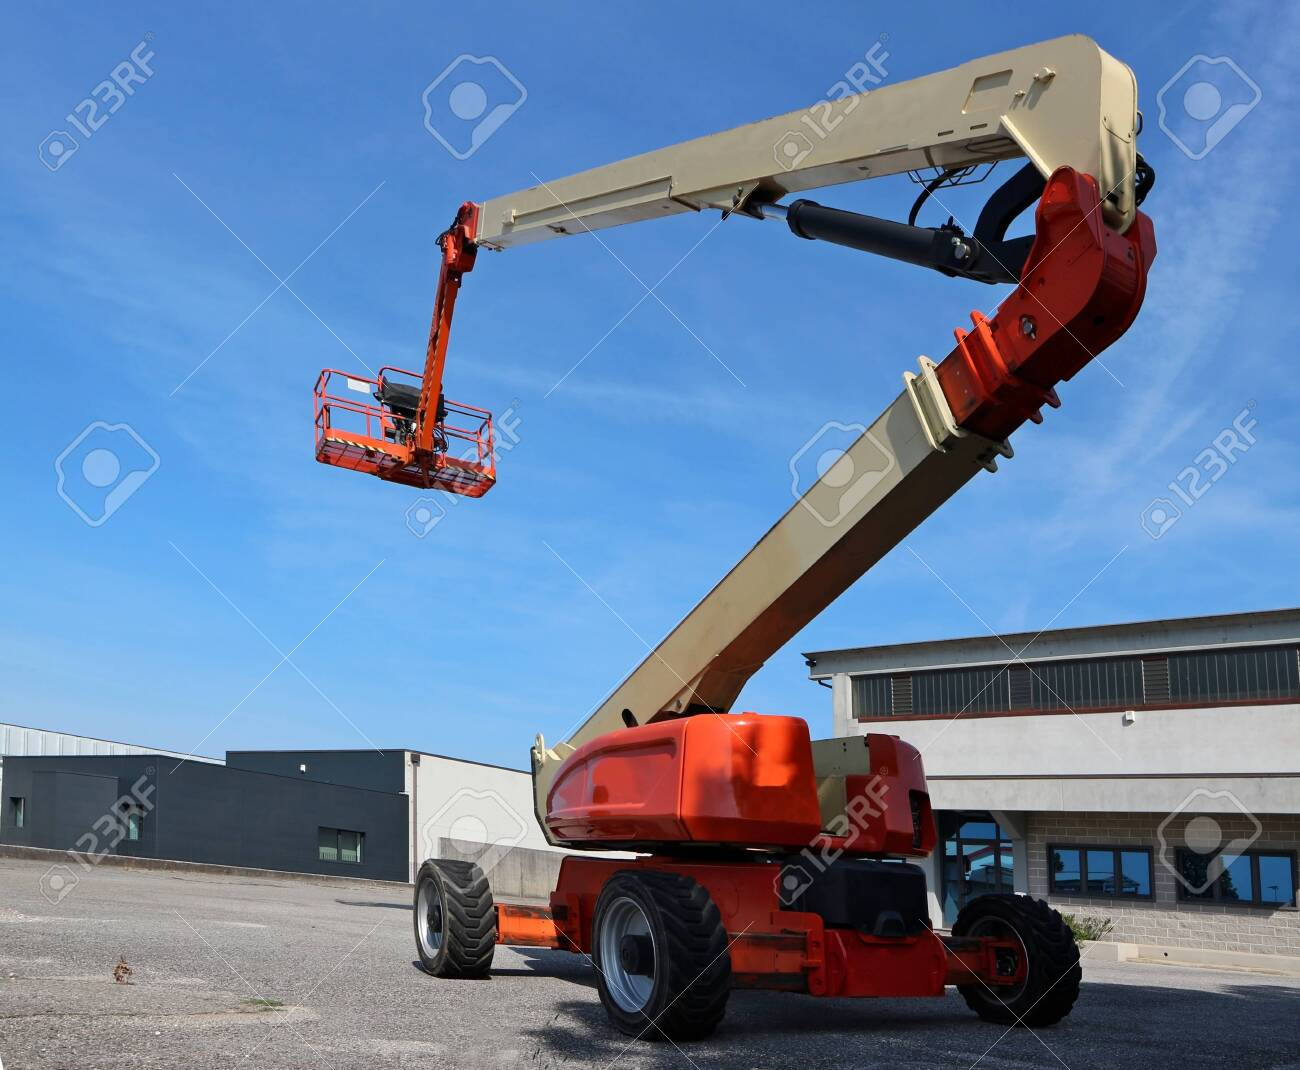 Aerial work platform in an industrial area. No people. - 145169627